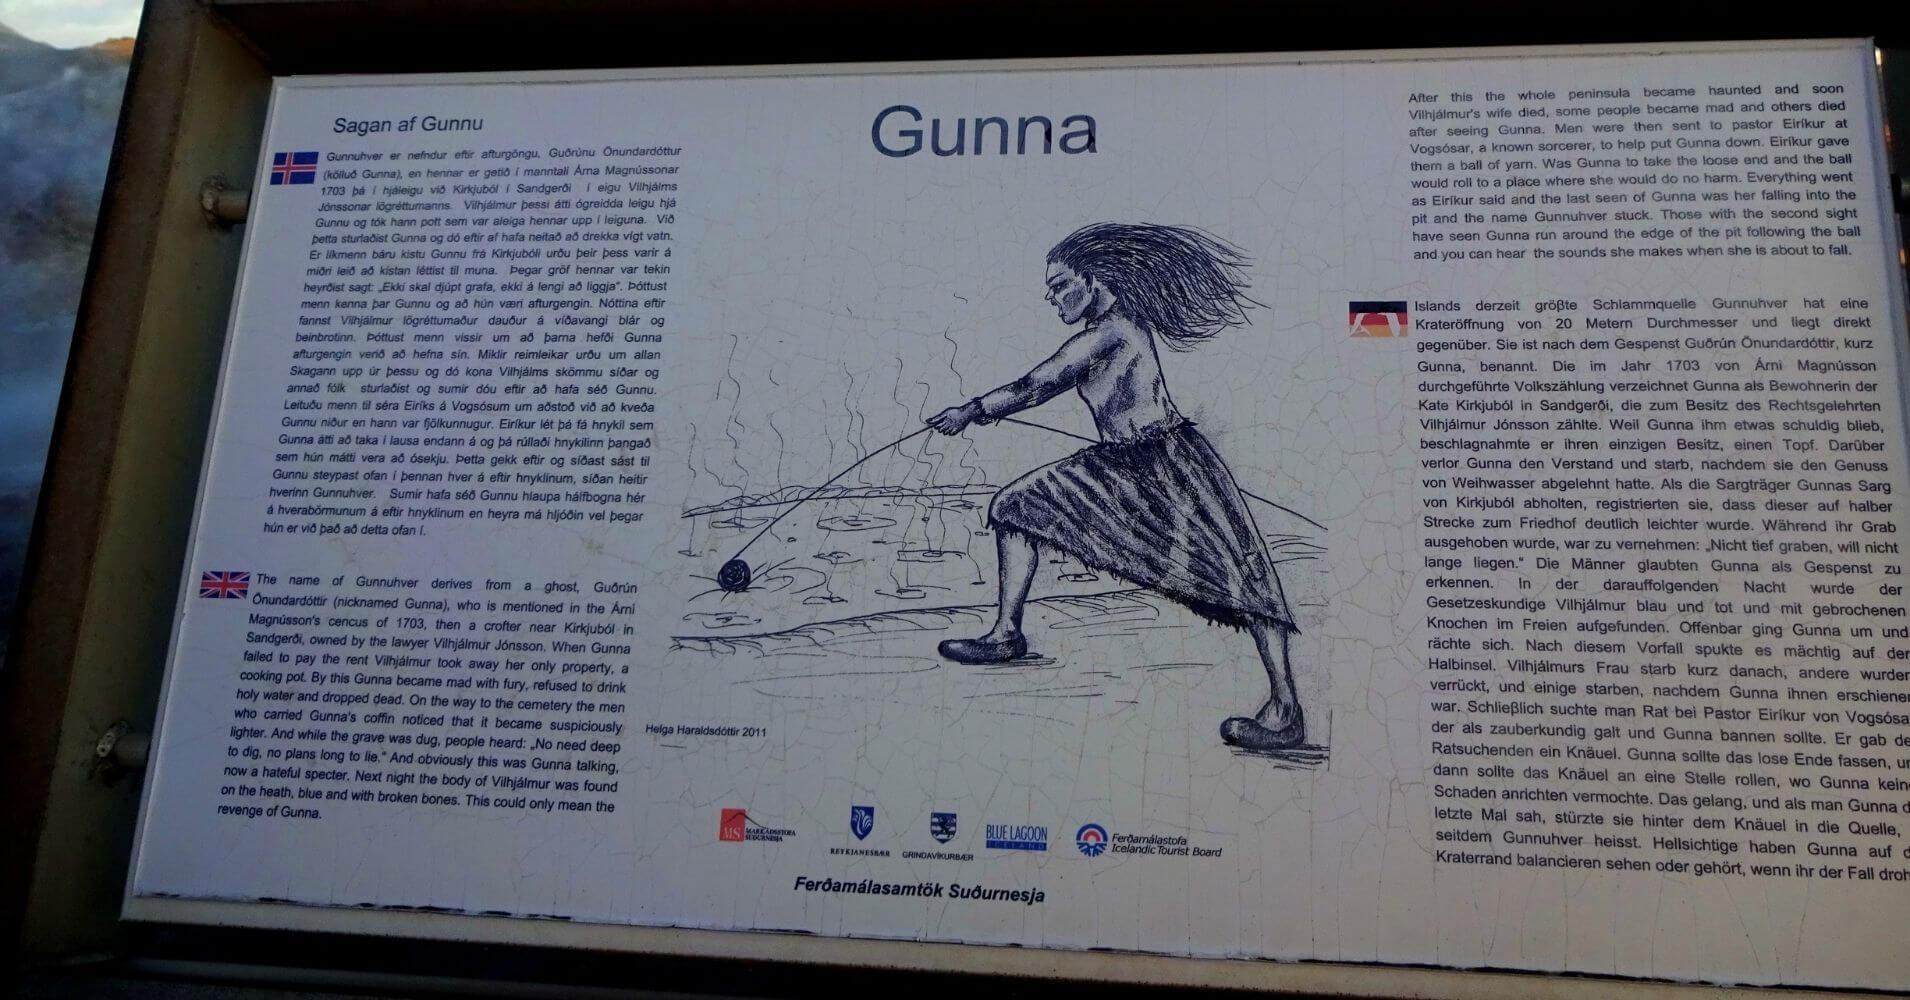 Área Geotermal de Gunnuhver. Leyenda de Gunna. Islandia.